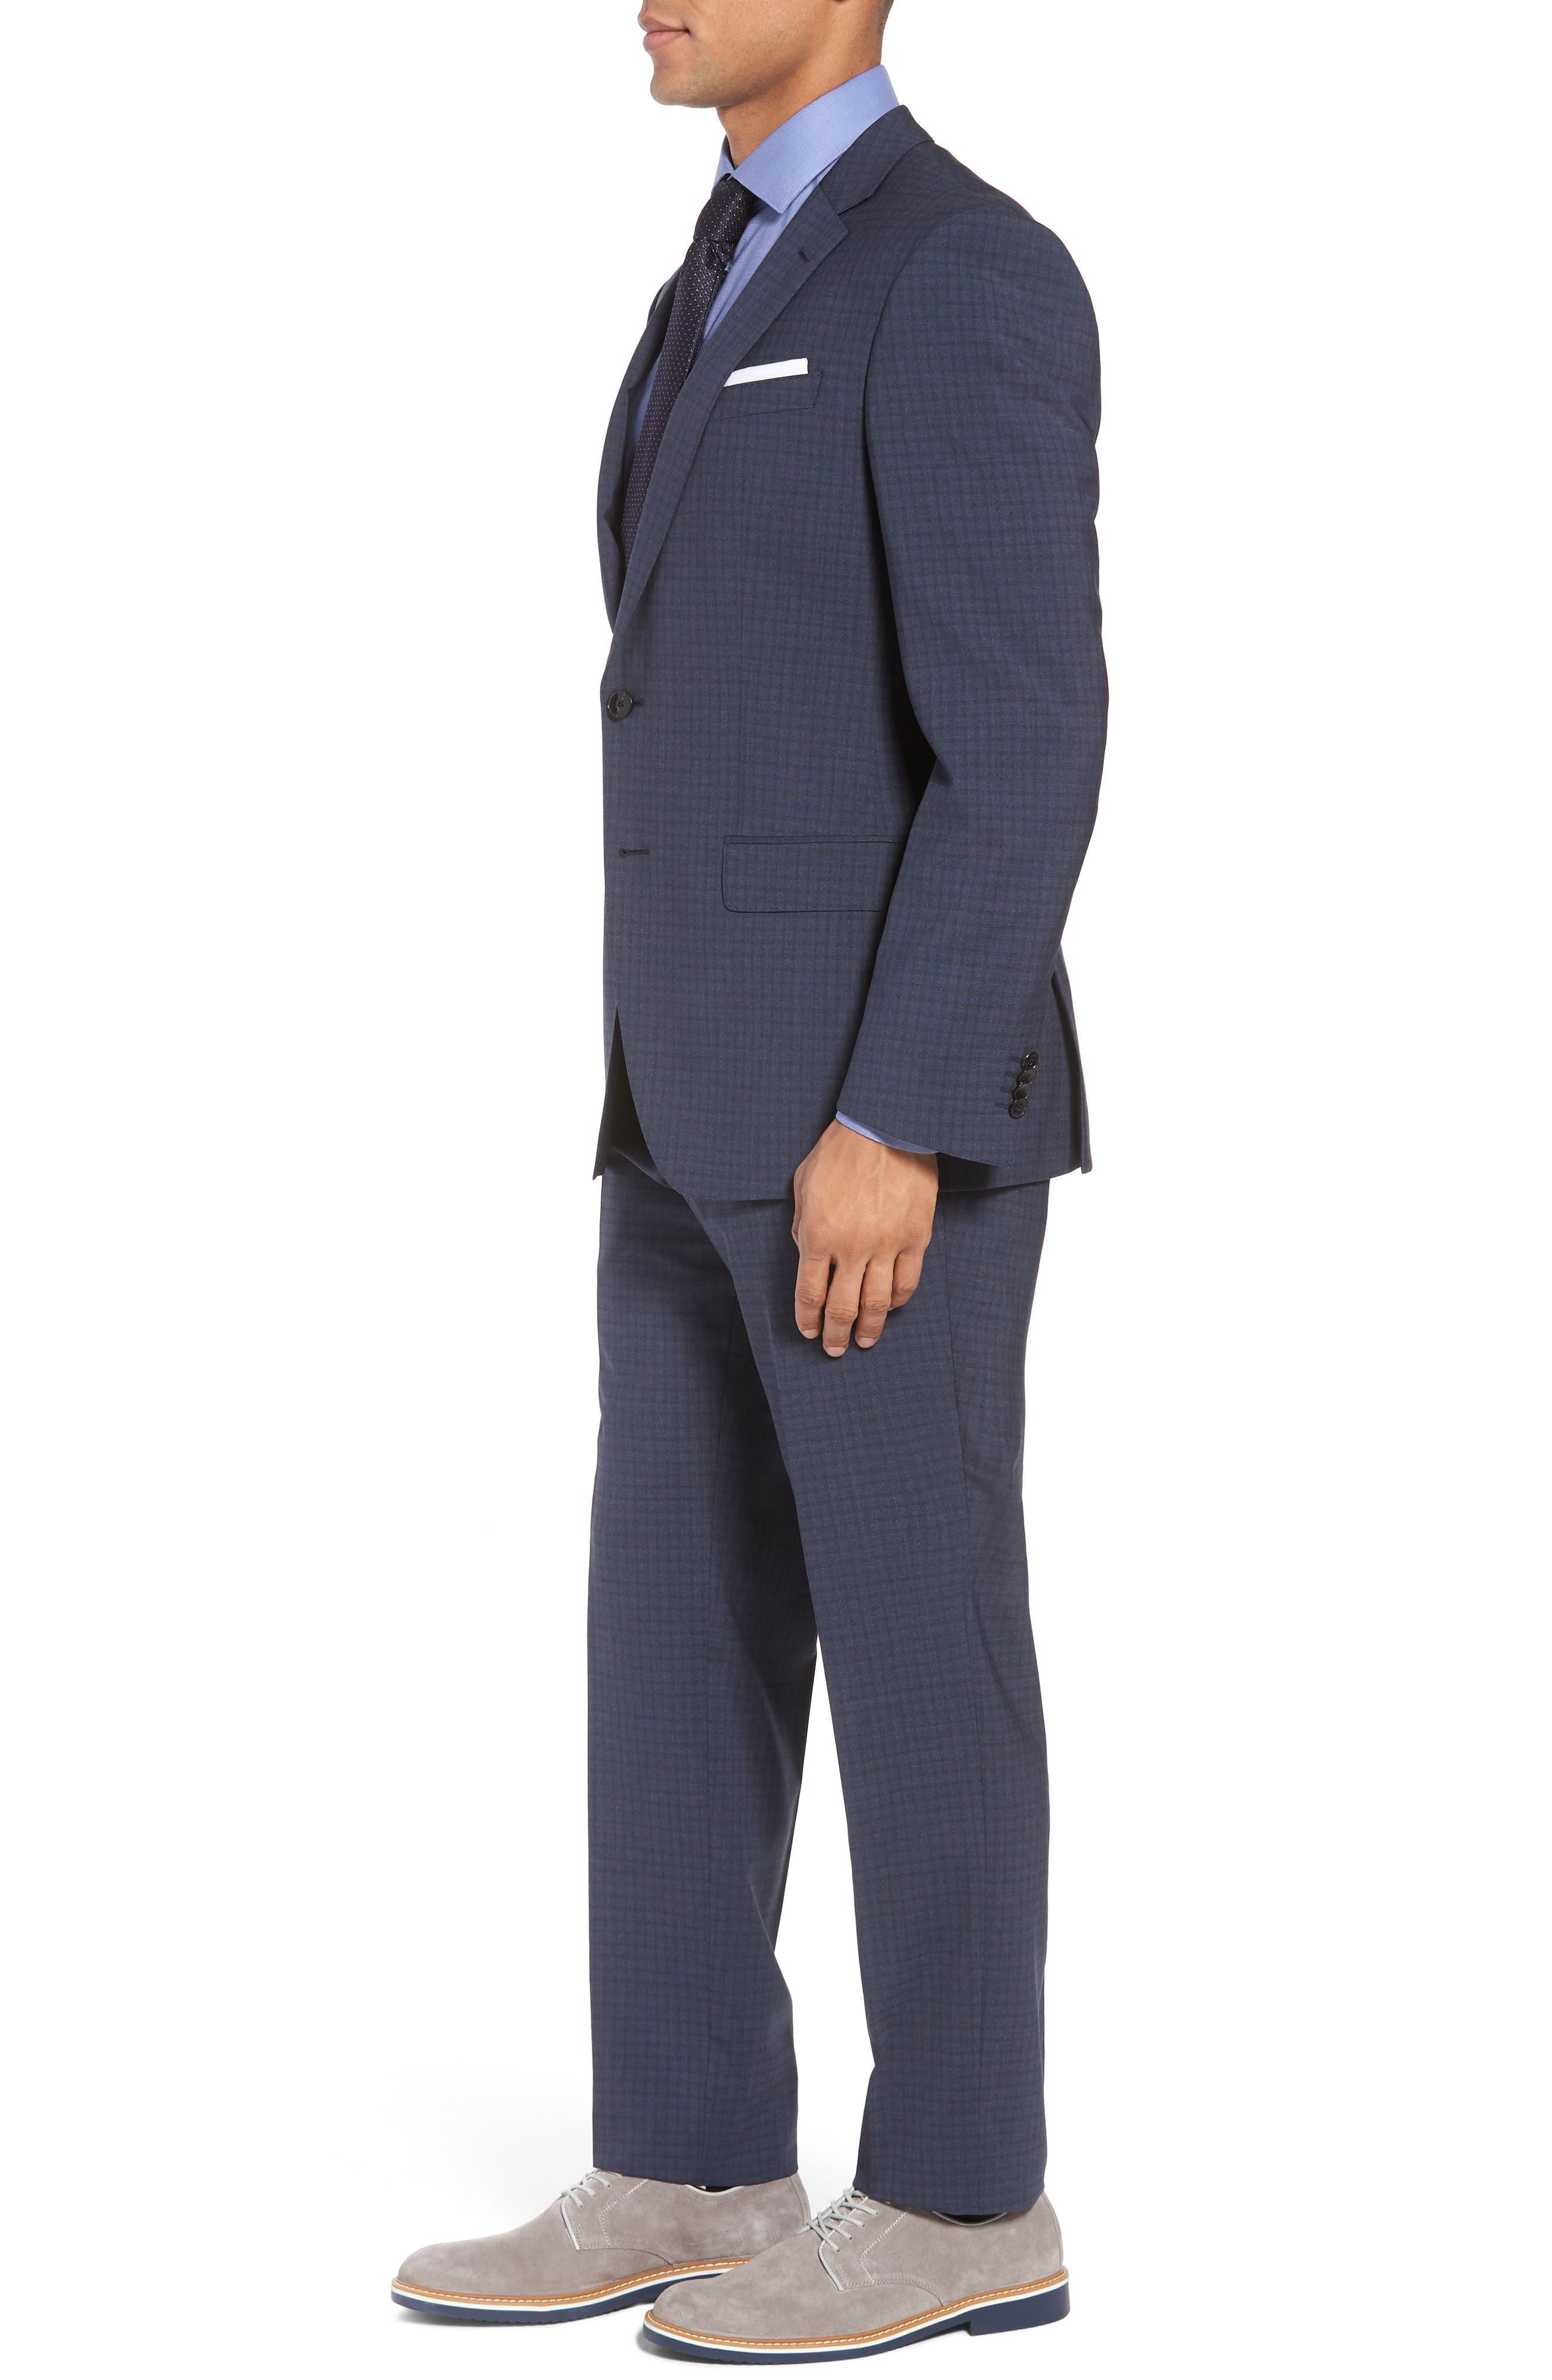 Huge/Genius Trim Fit Check Wool Suit,                             Alternate thumbnail 3, color,                             Blue/ Brown/ Charcoal